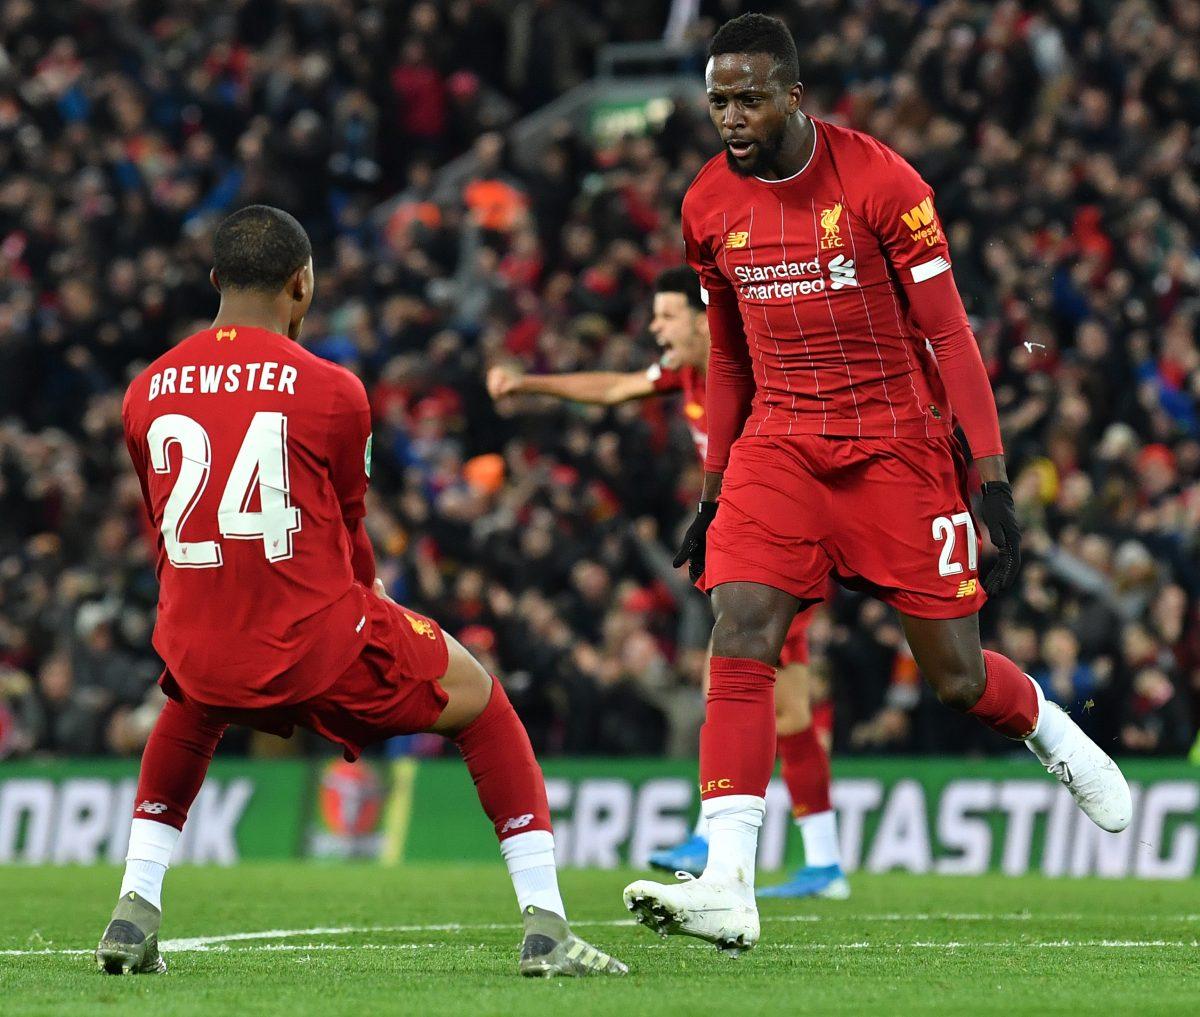 Liverpool - Arsenal